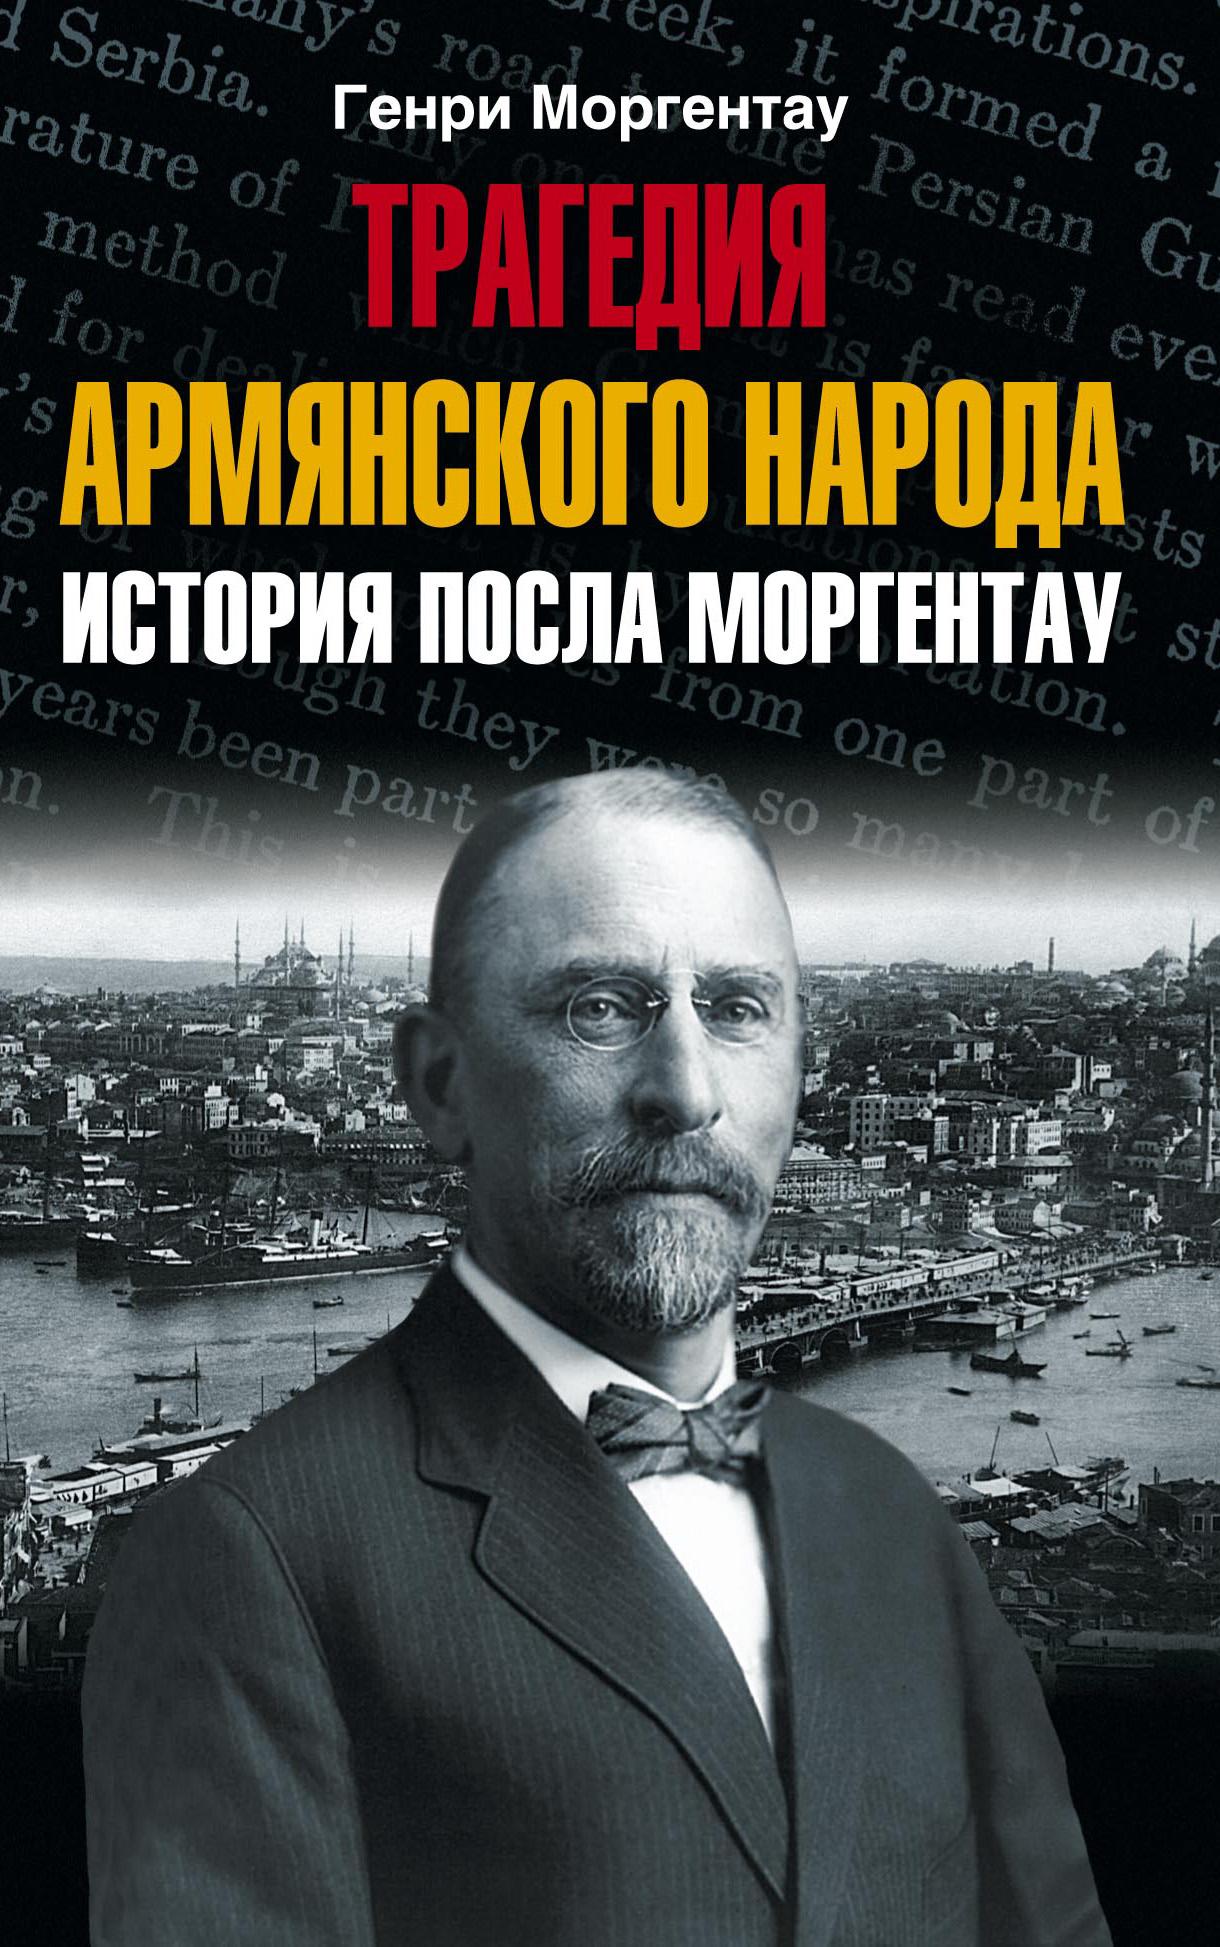 Генри Моргентау Трагедия армянского народа. История посла Моргентау